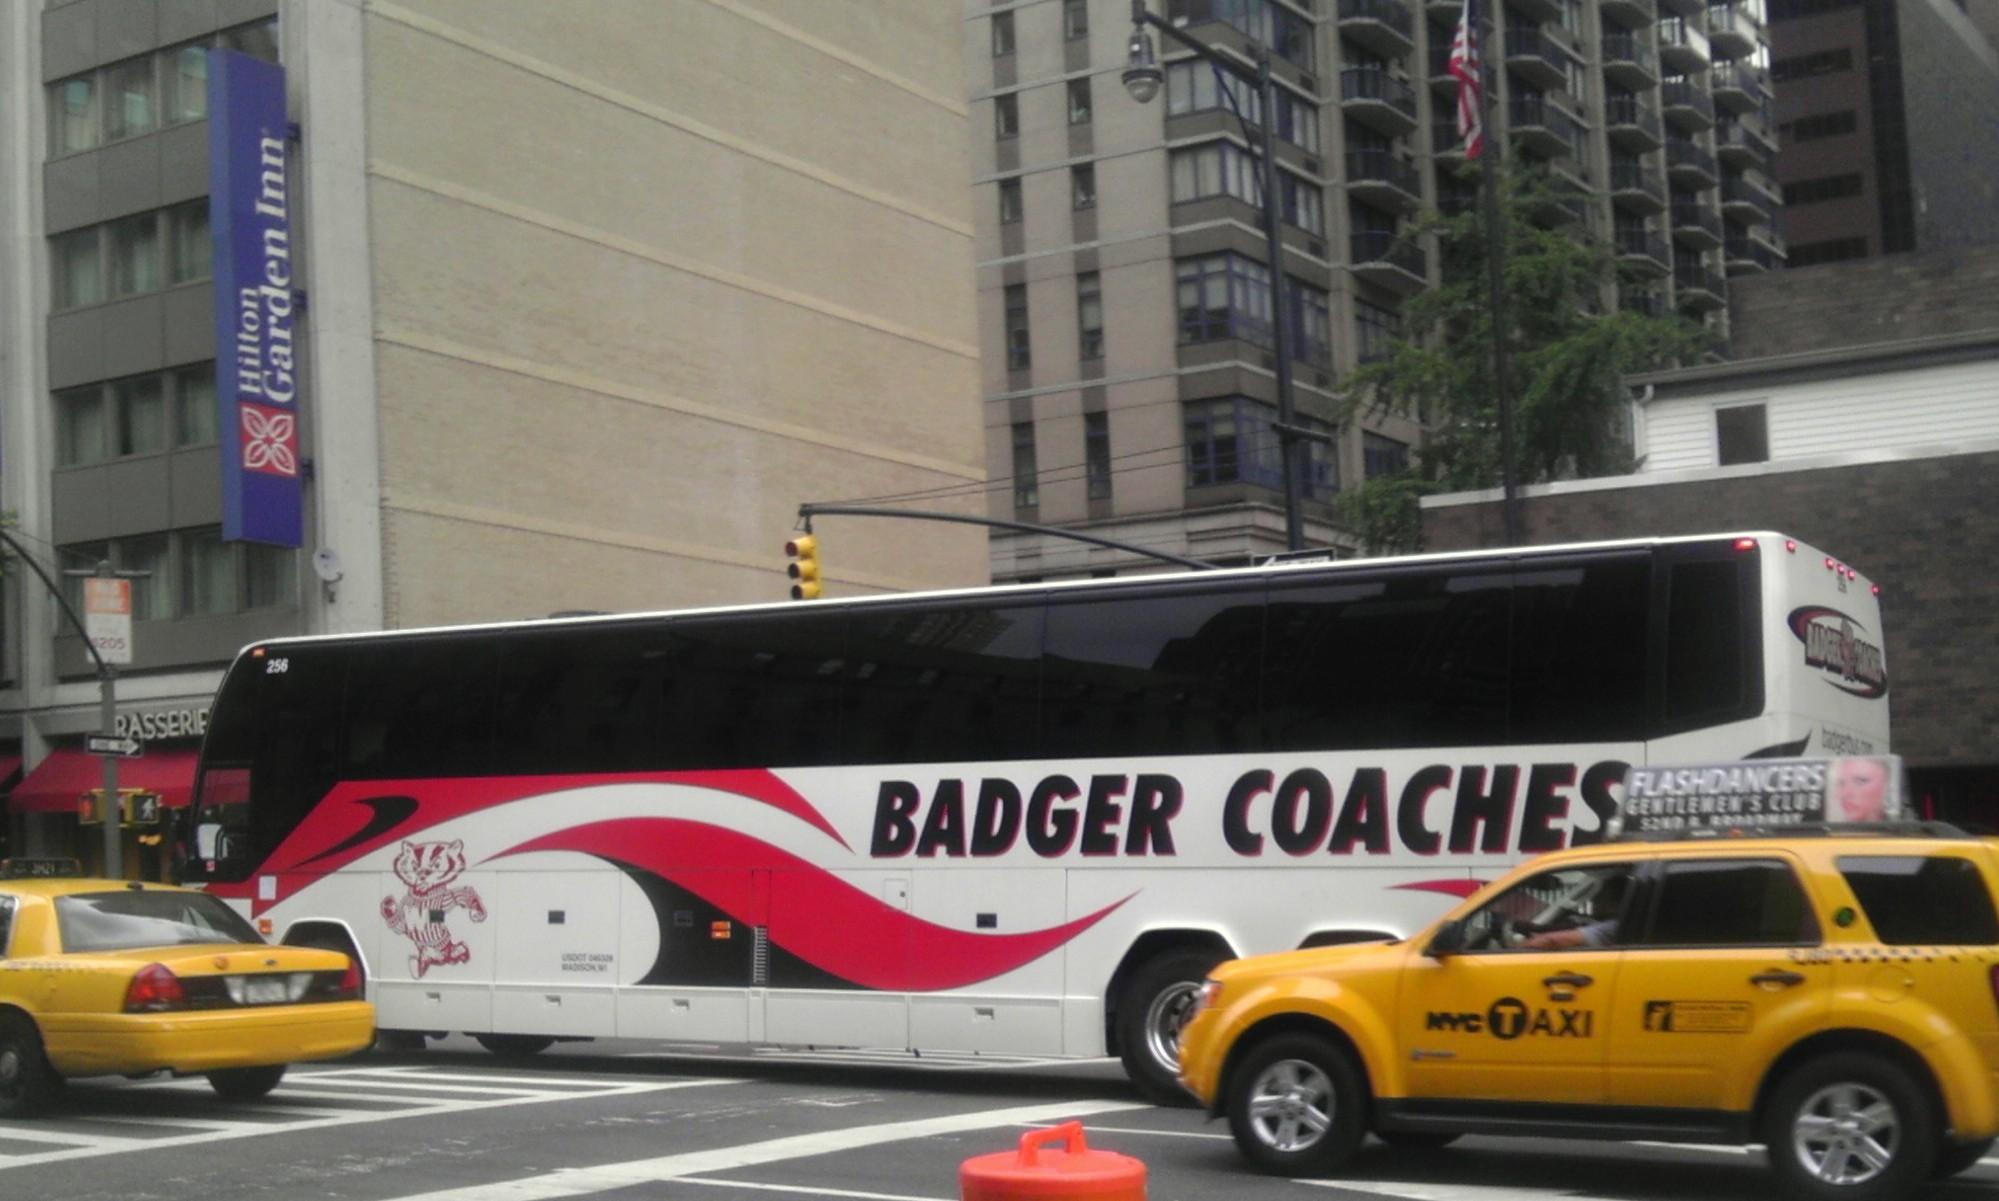 badger bus - wikipedia